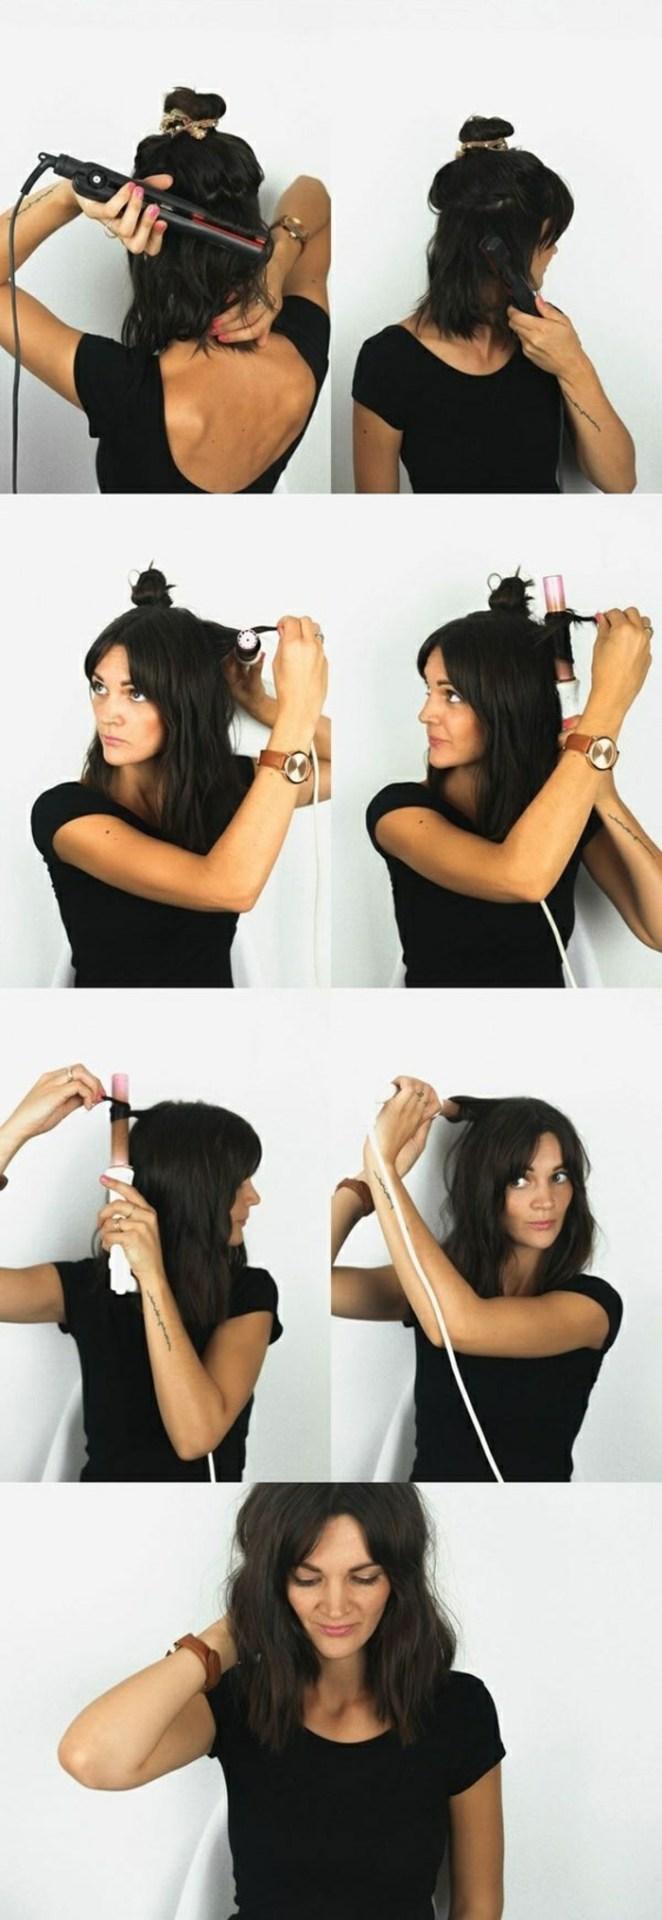 Long hairstyles, black hair, a curling iron to volume, black hair, black dress